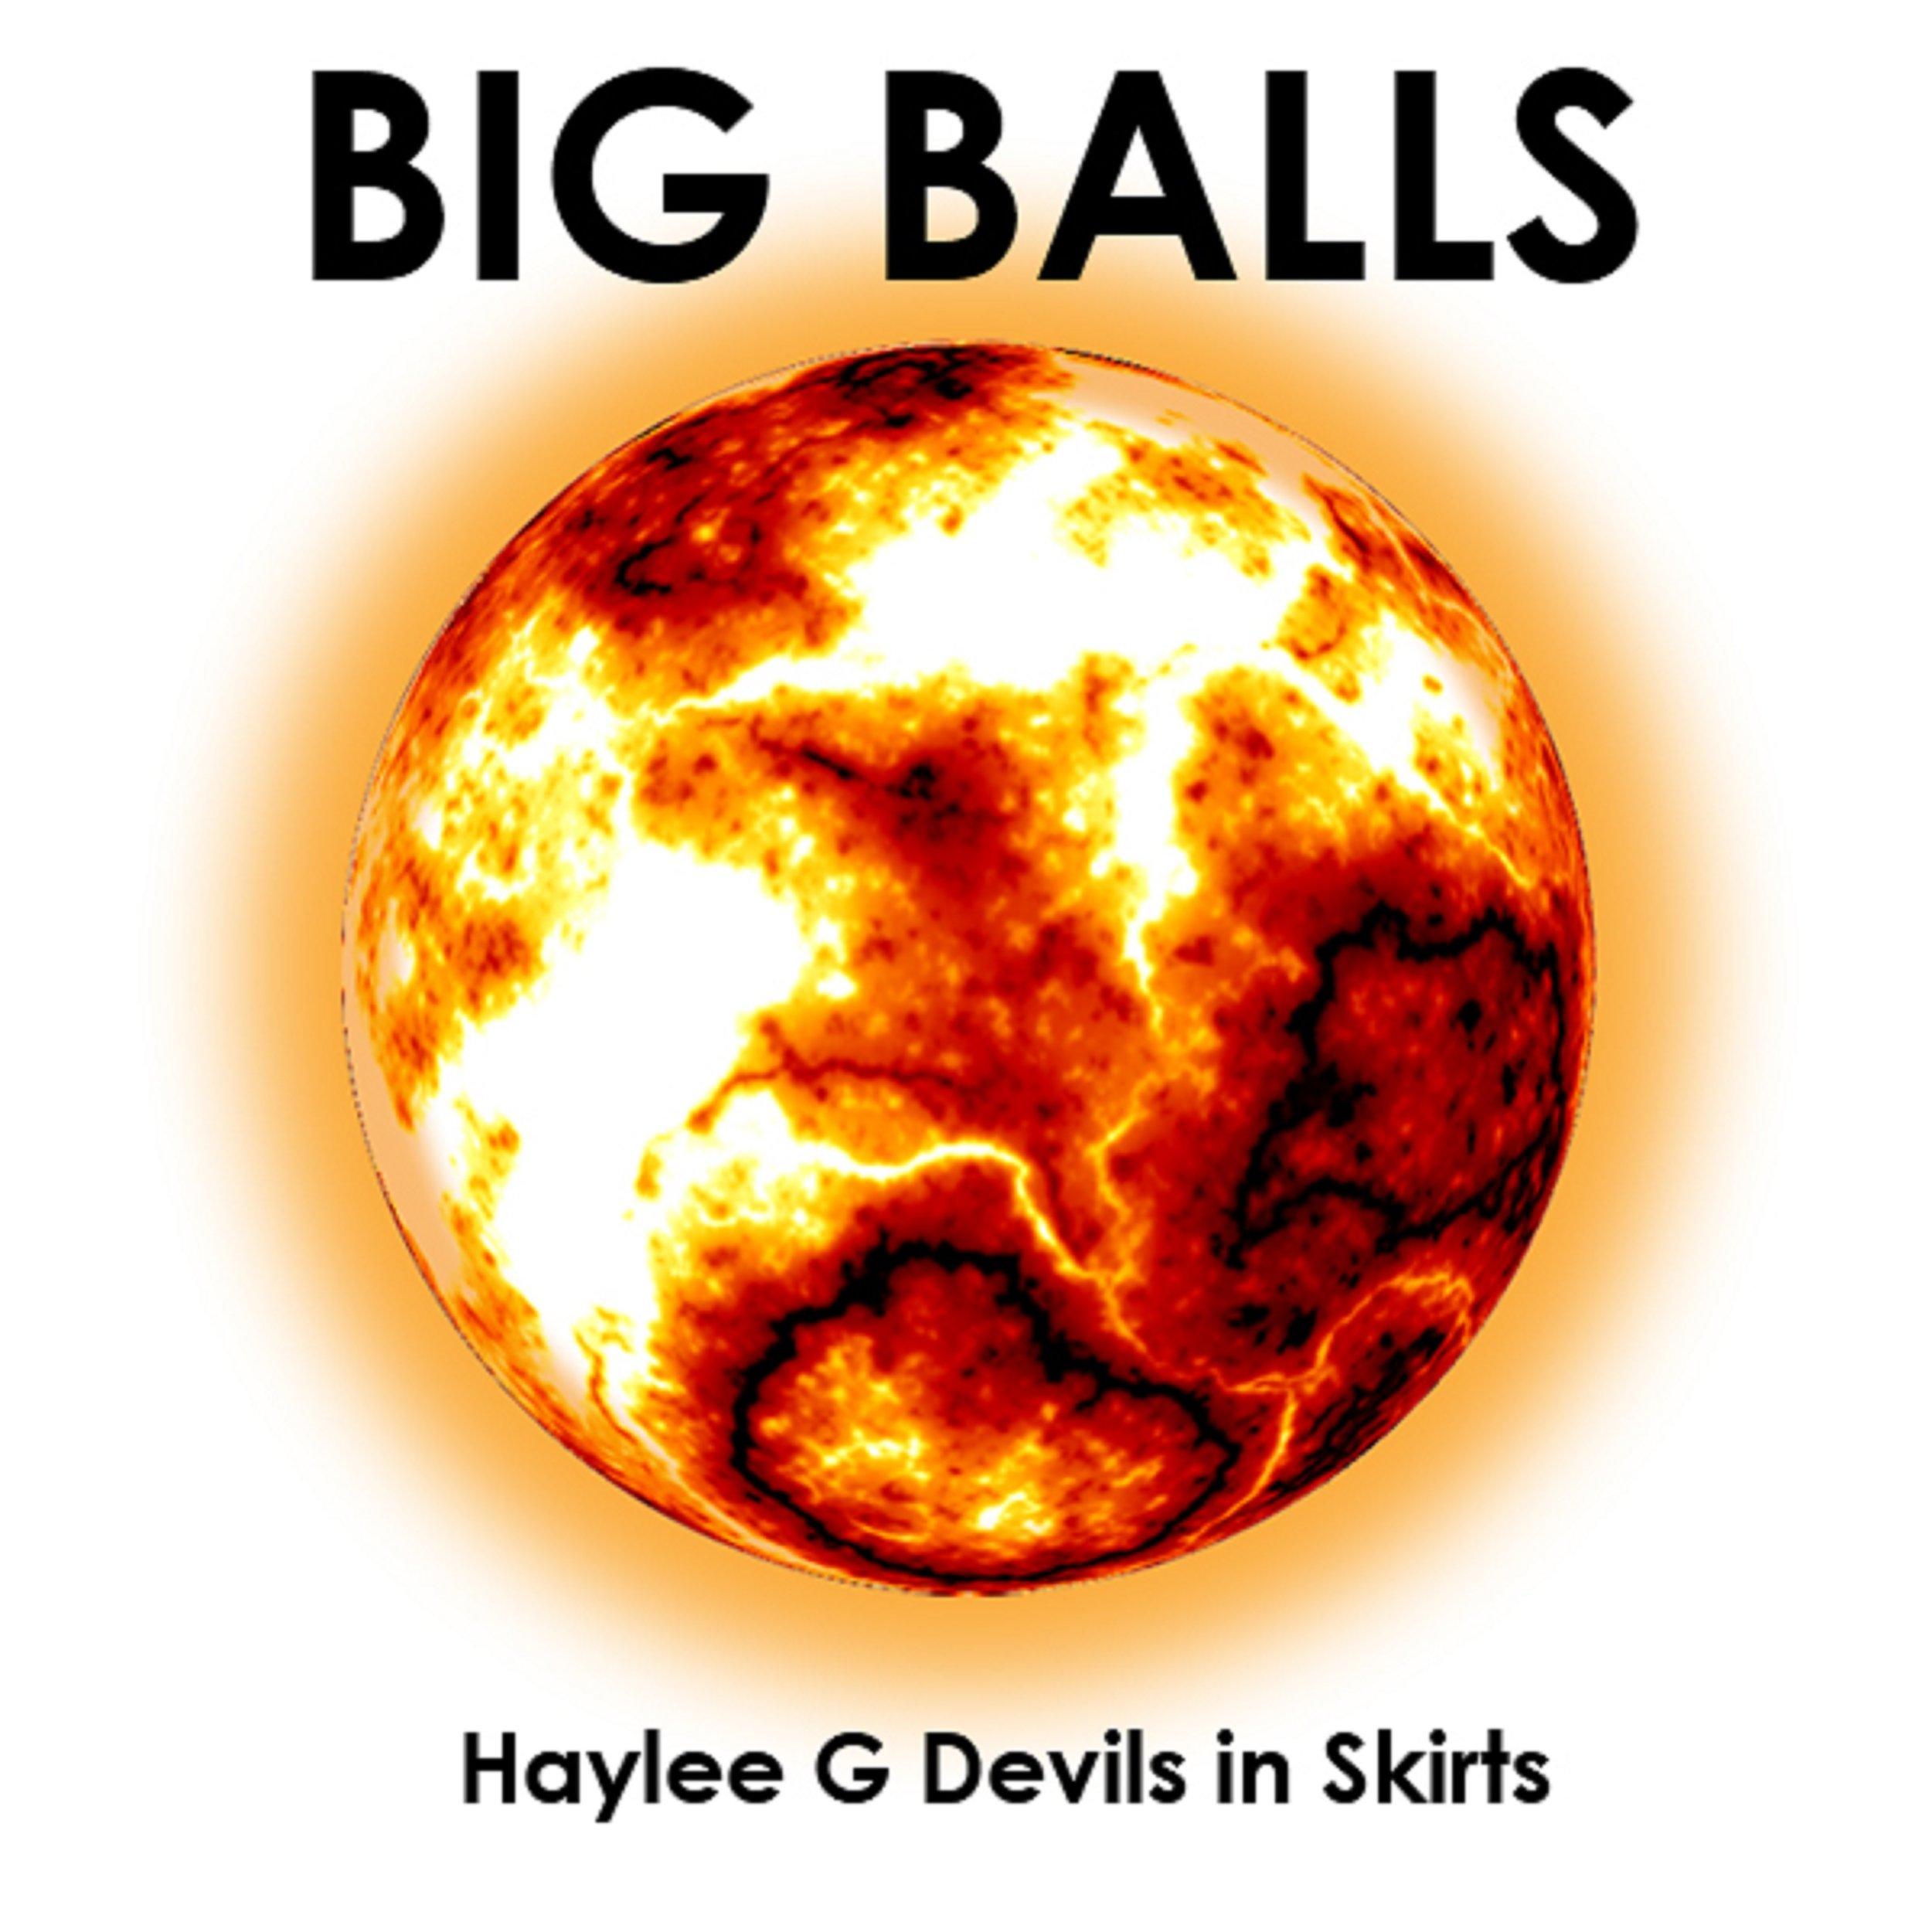 big balls SINGLE COVER.jpg